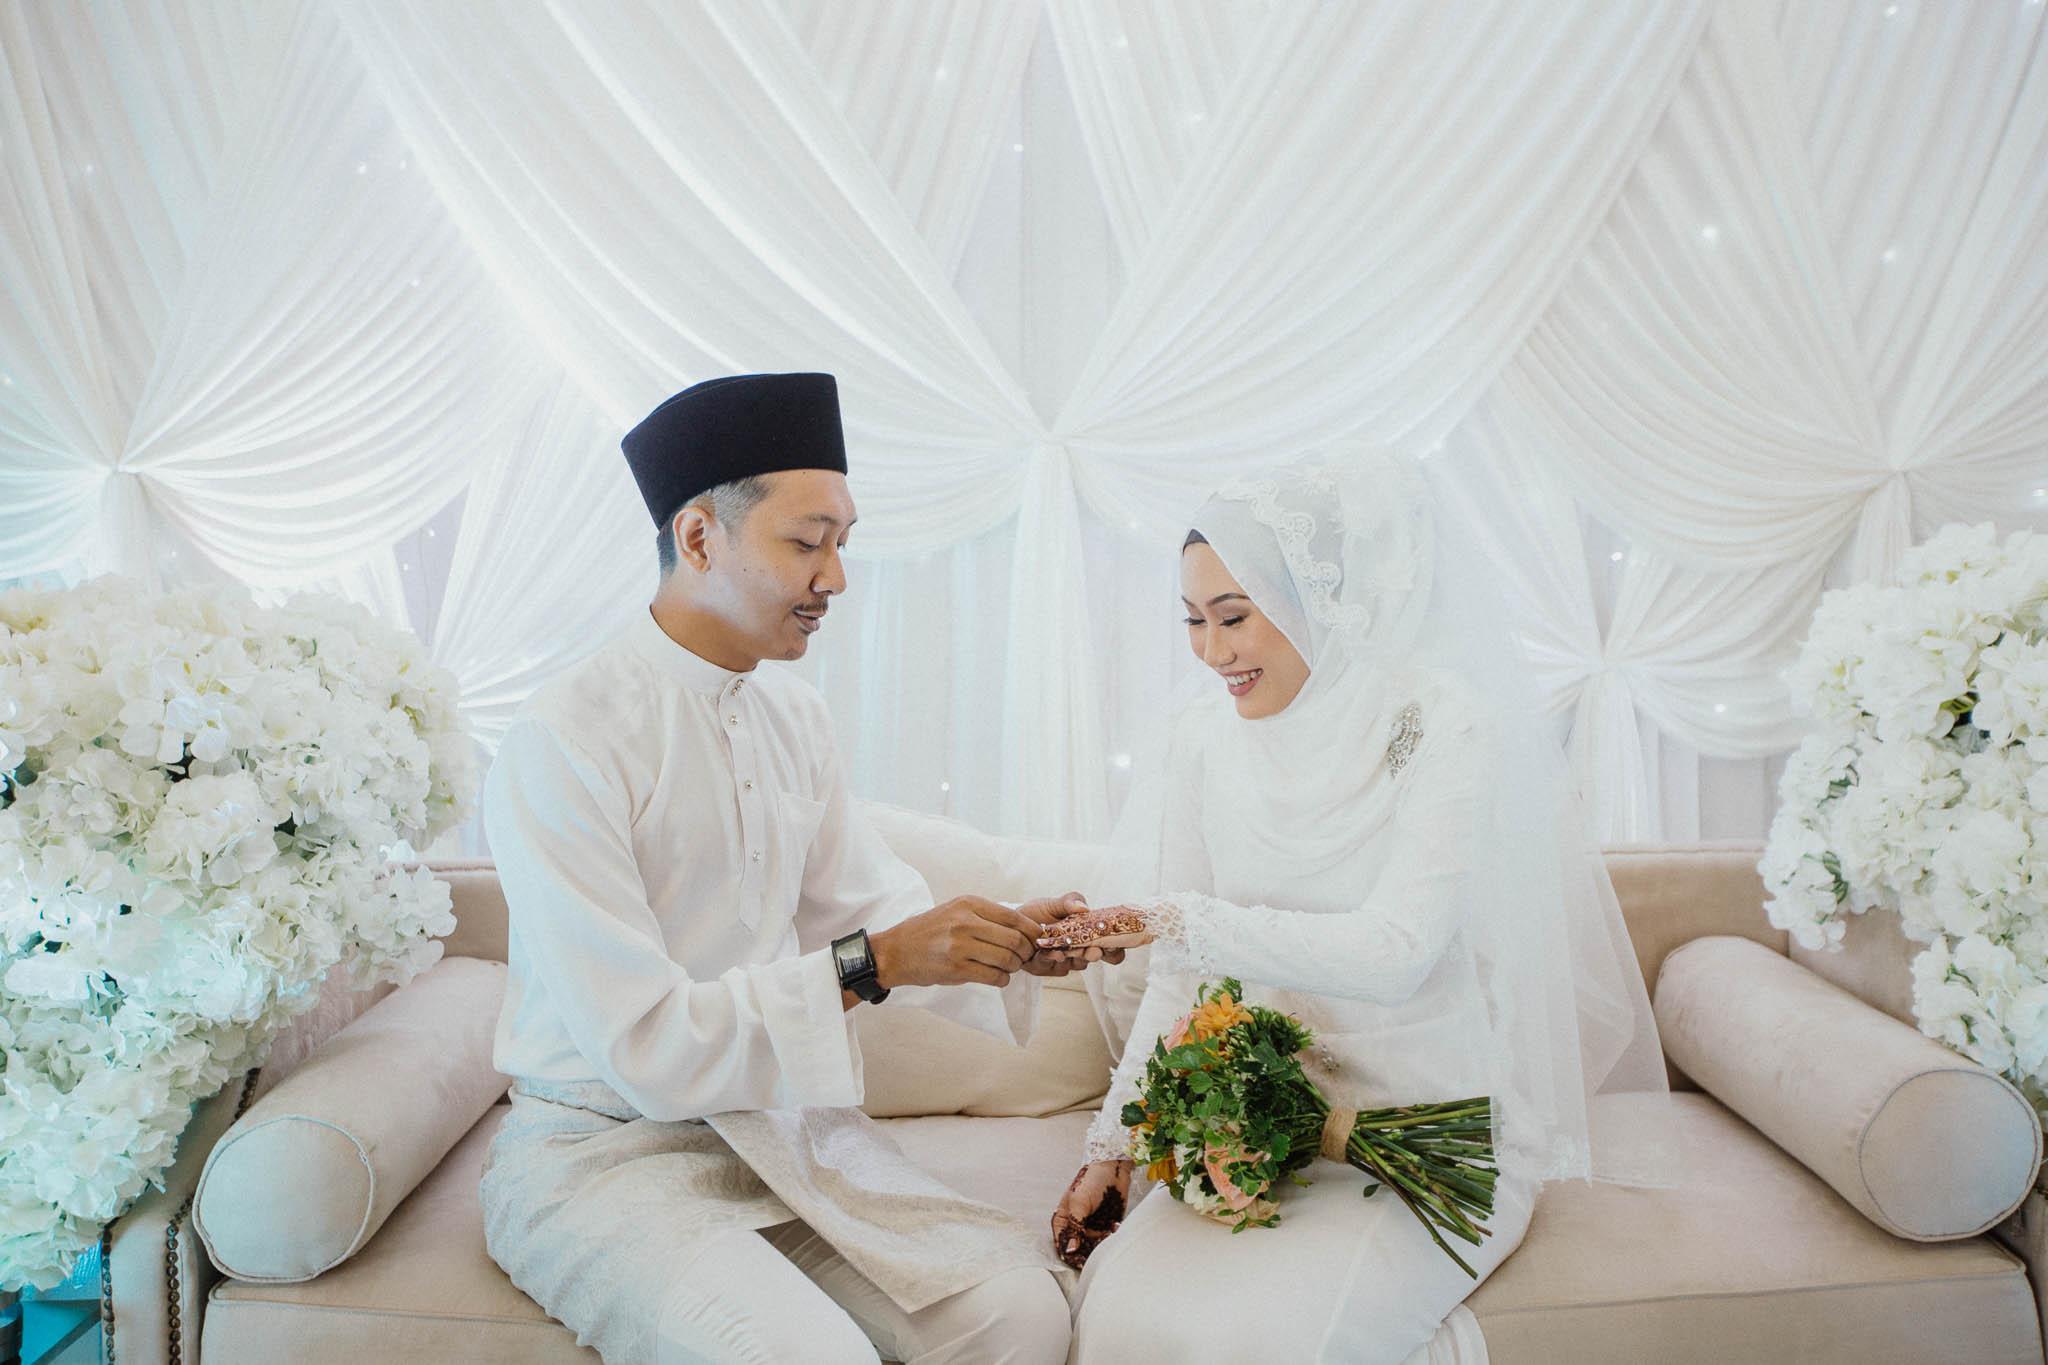 singapore-wedding-photographer-addafiq-nufail-026.jpg